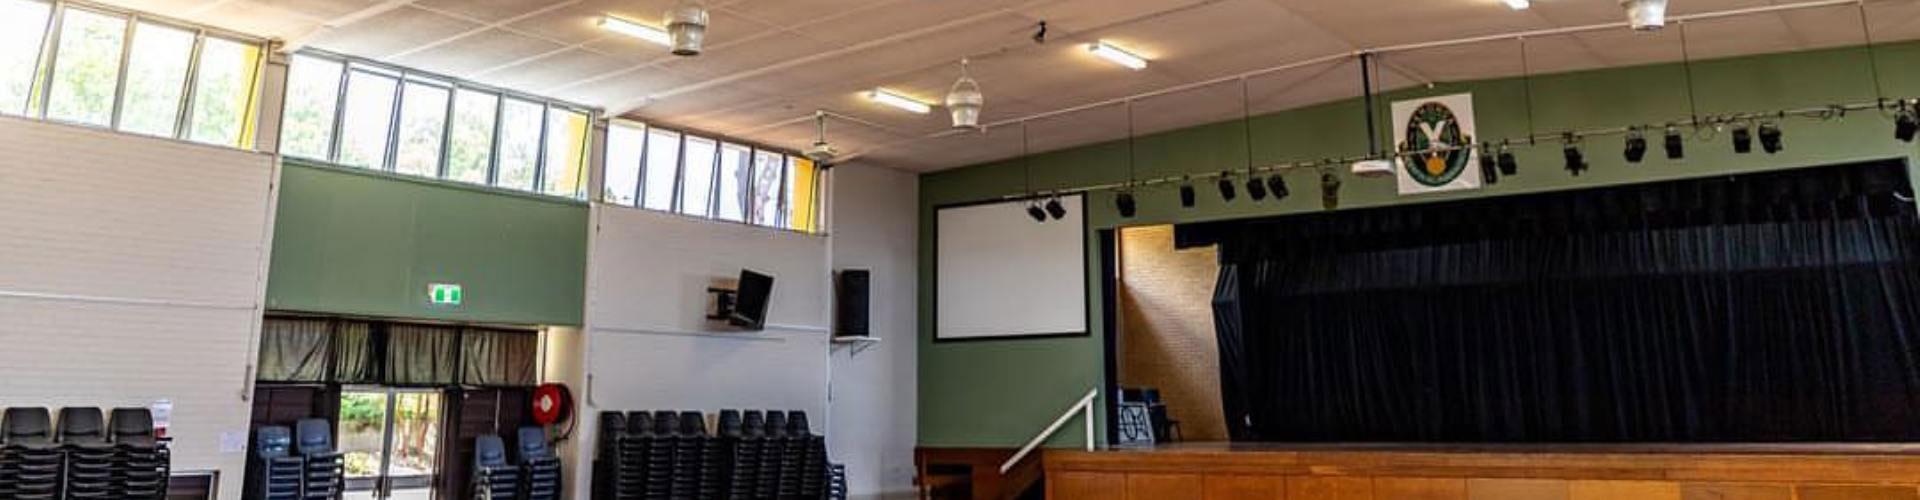 Destratification Fan System Educational Slider 6